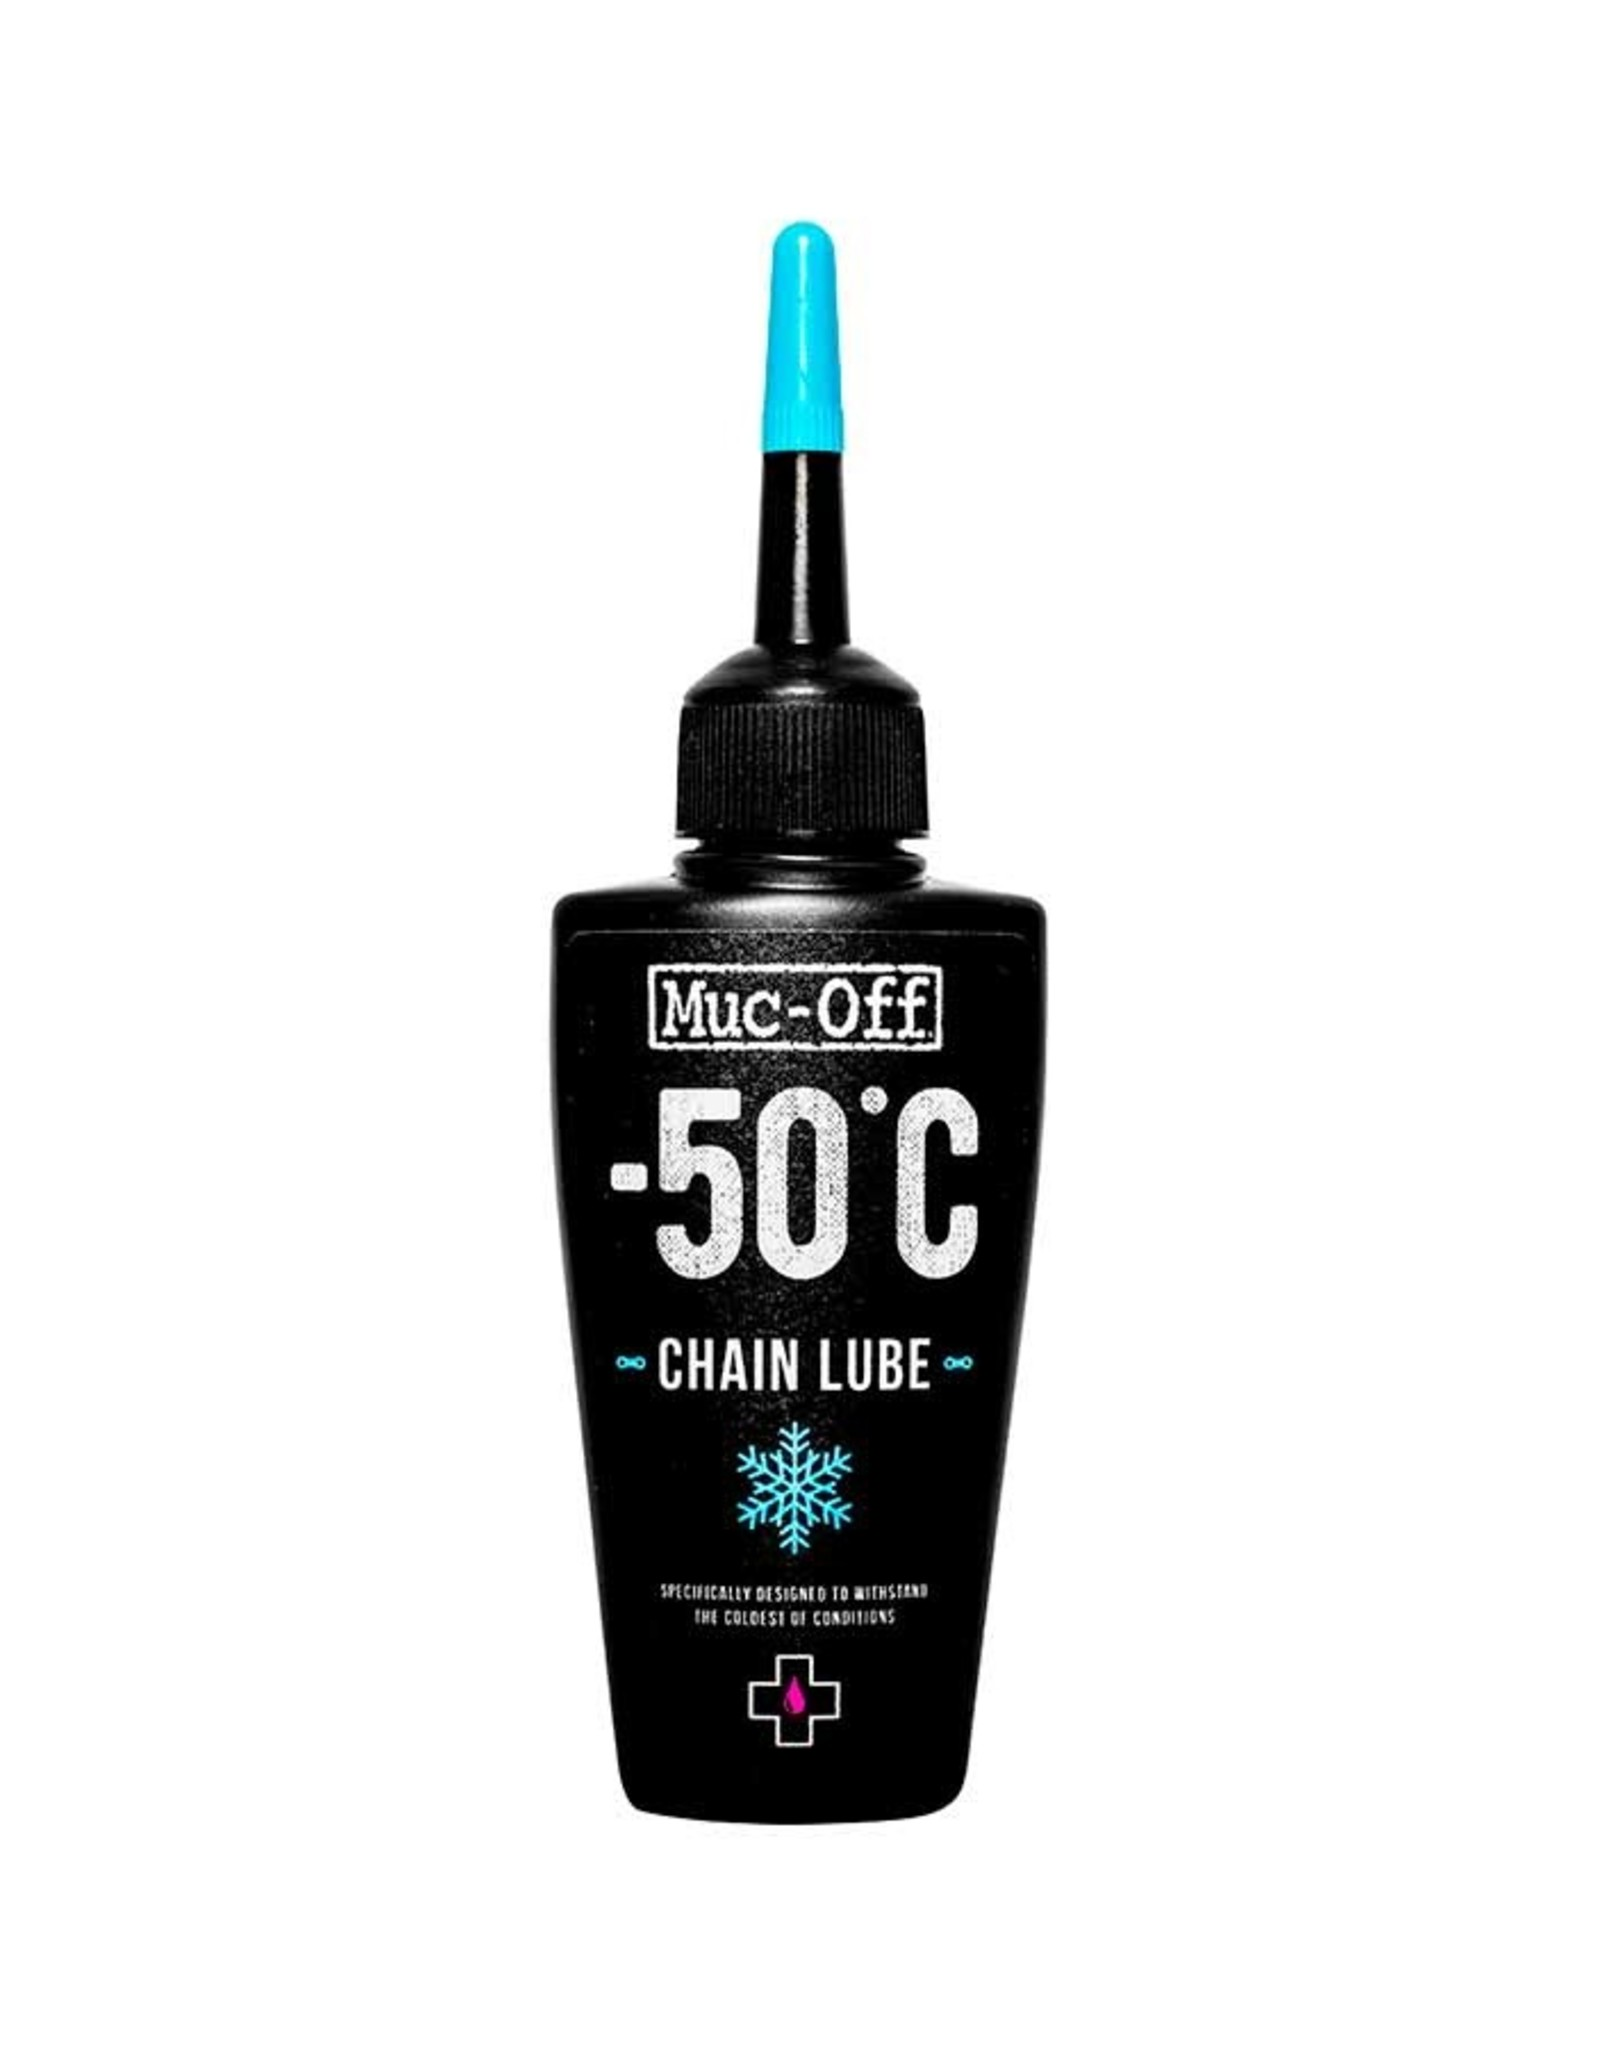 Muc-Off Muc off, -50C, Lube, 50ml